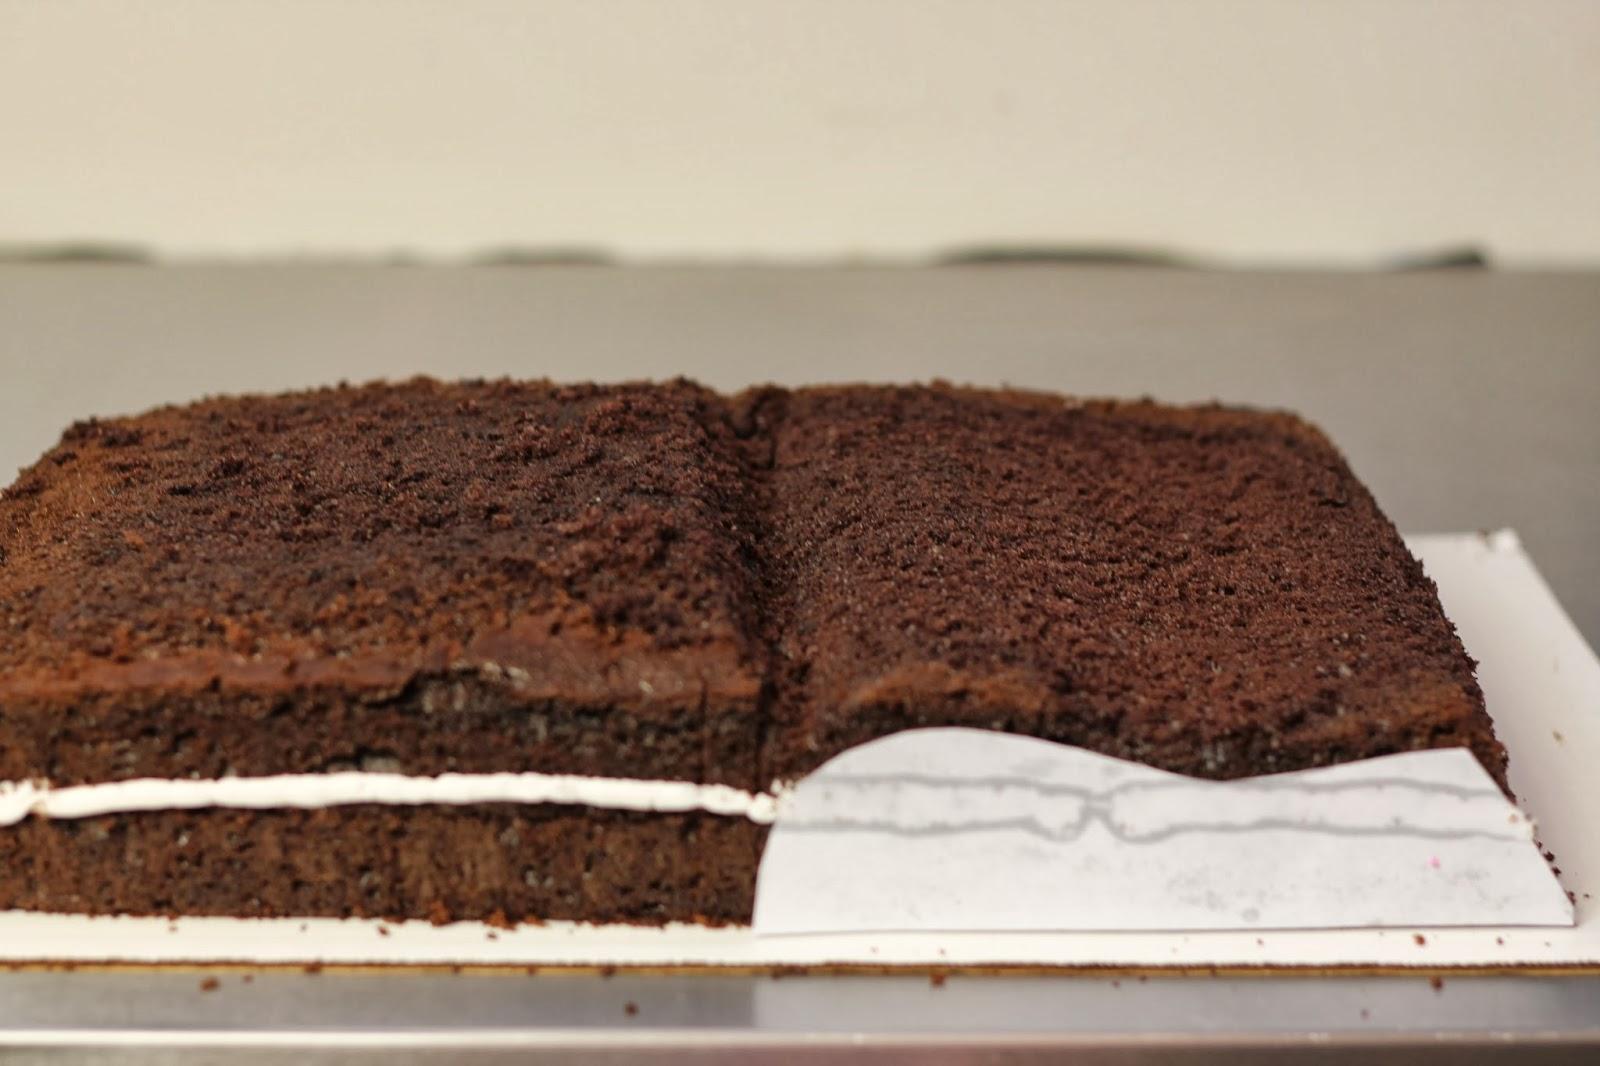 How To Make A Book Cake : Make me my cake book tutorial